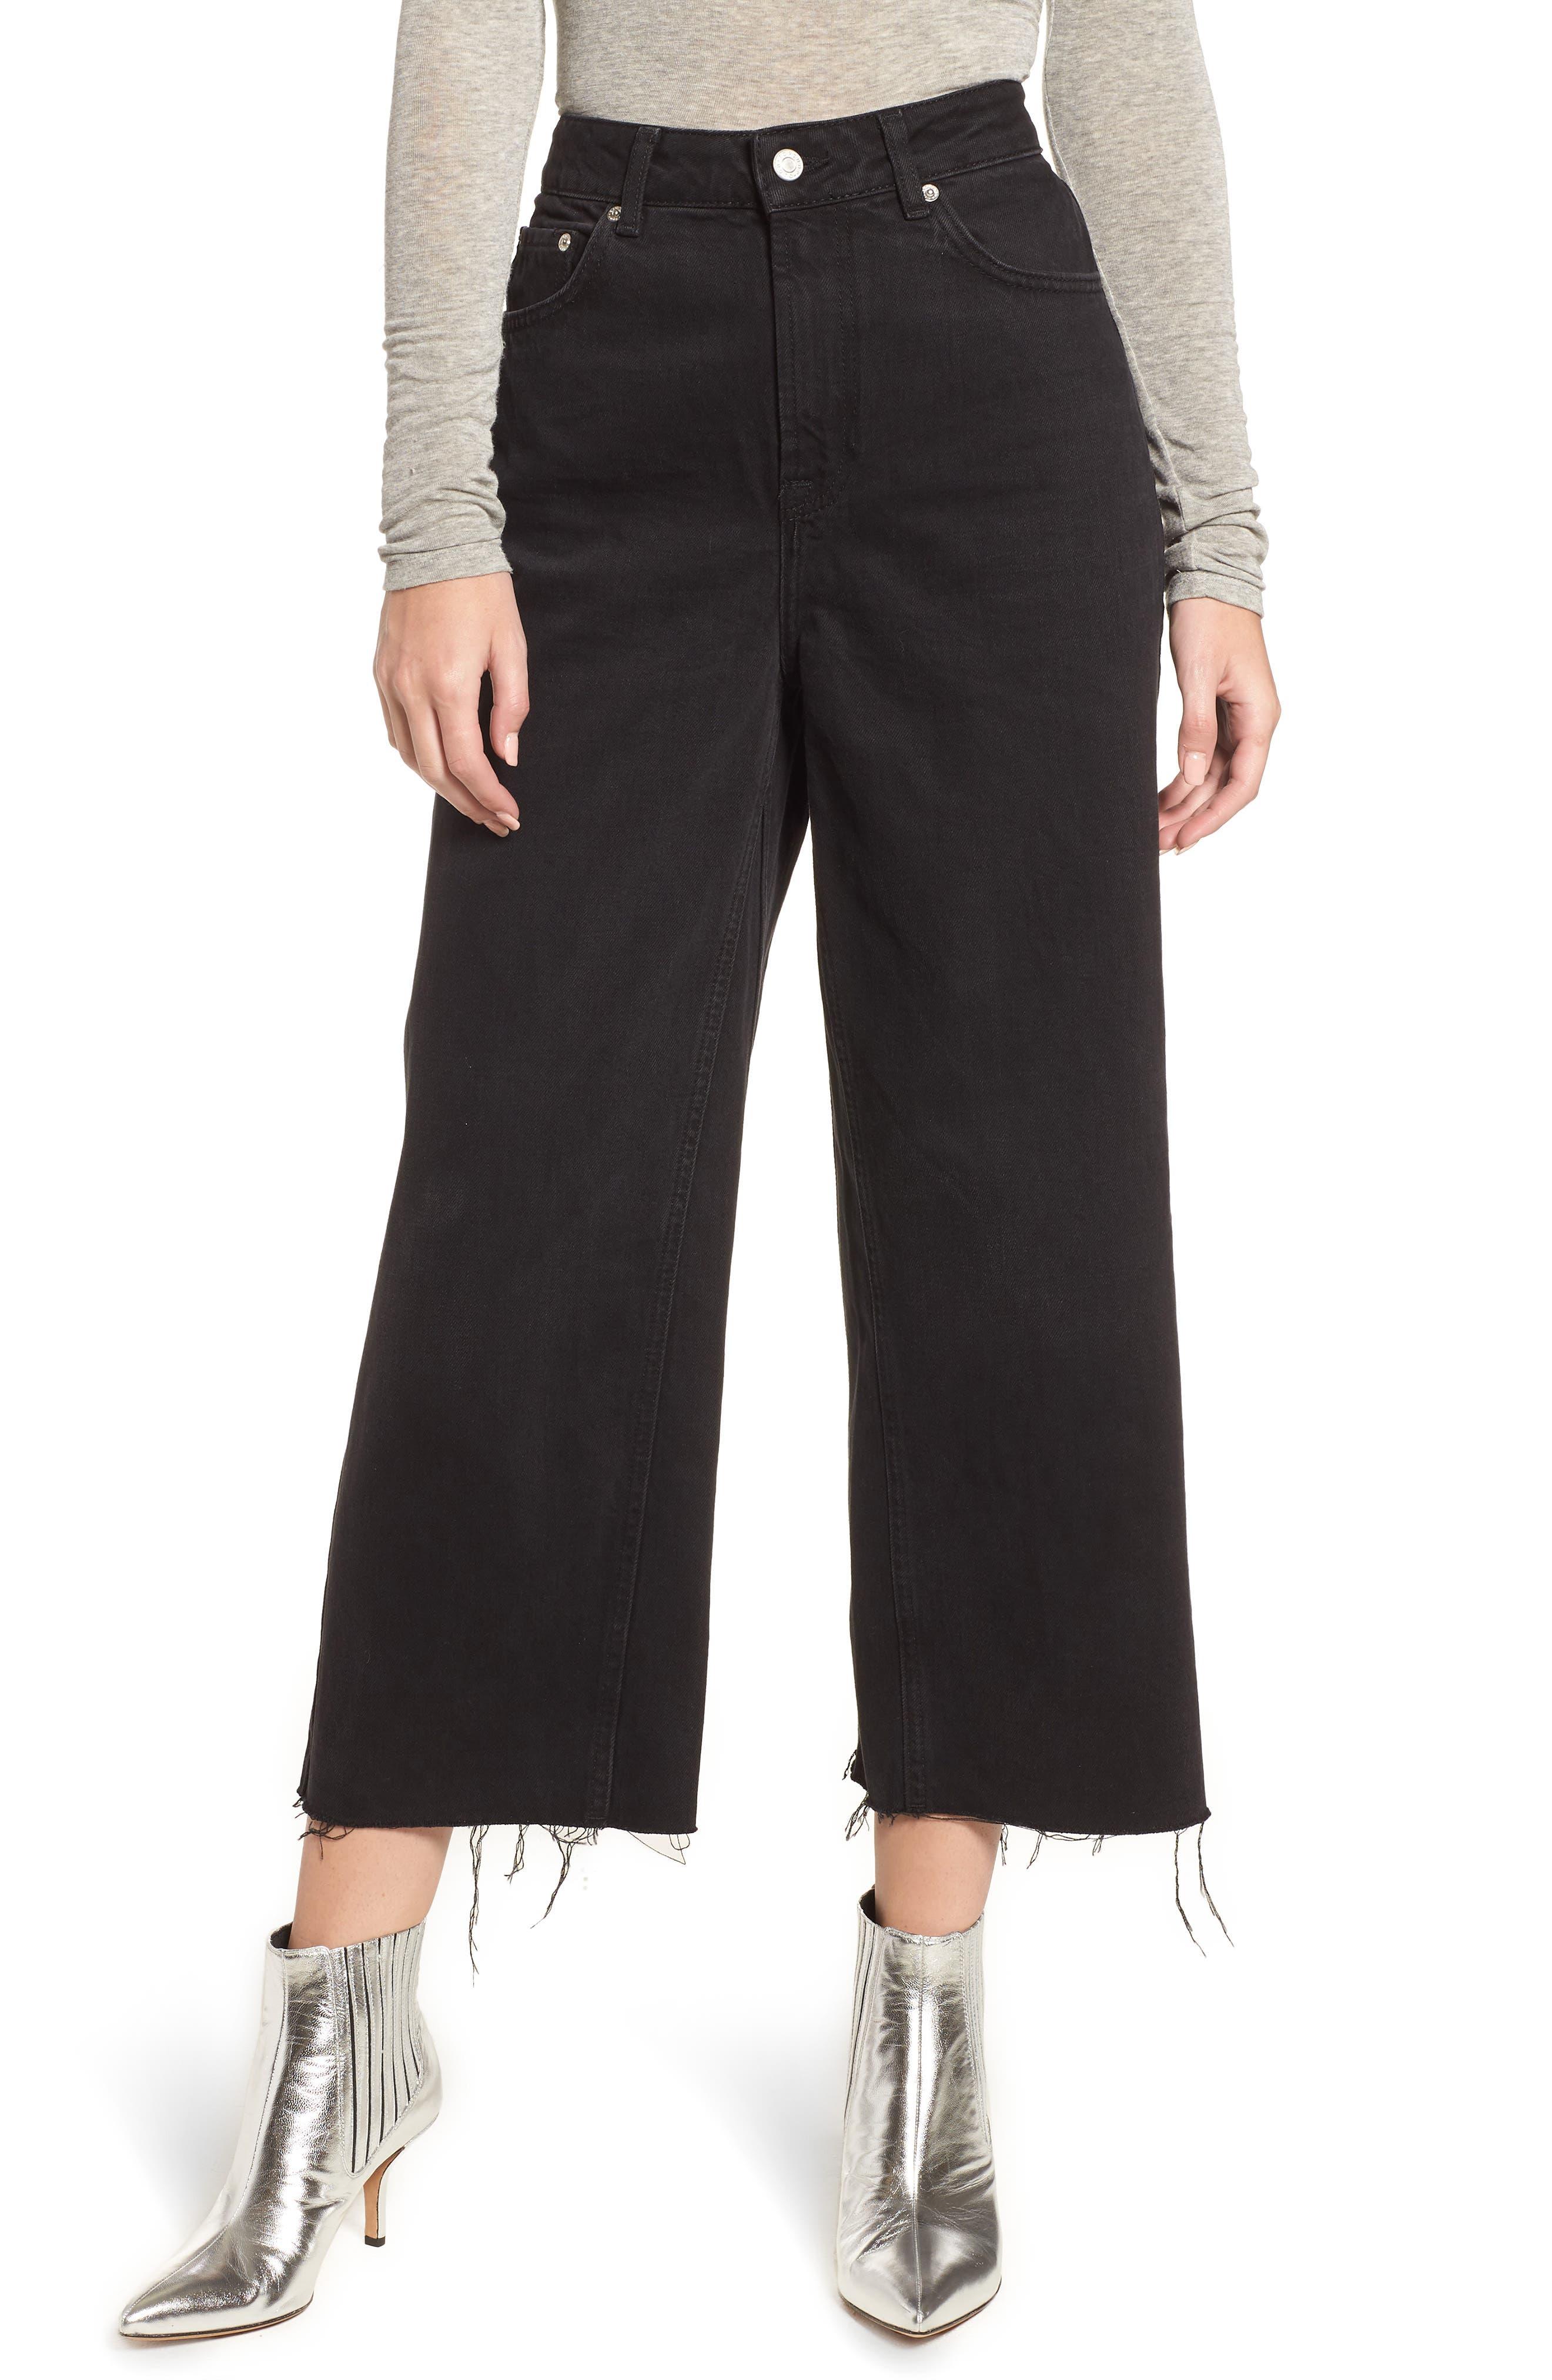 TOPSHOP, Wide Leg Crop Jeans, Main thumbnail 1, color, WASHED BLACK